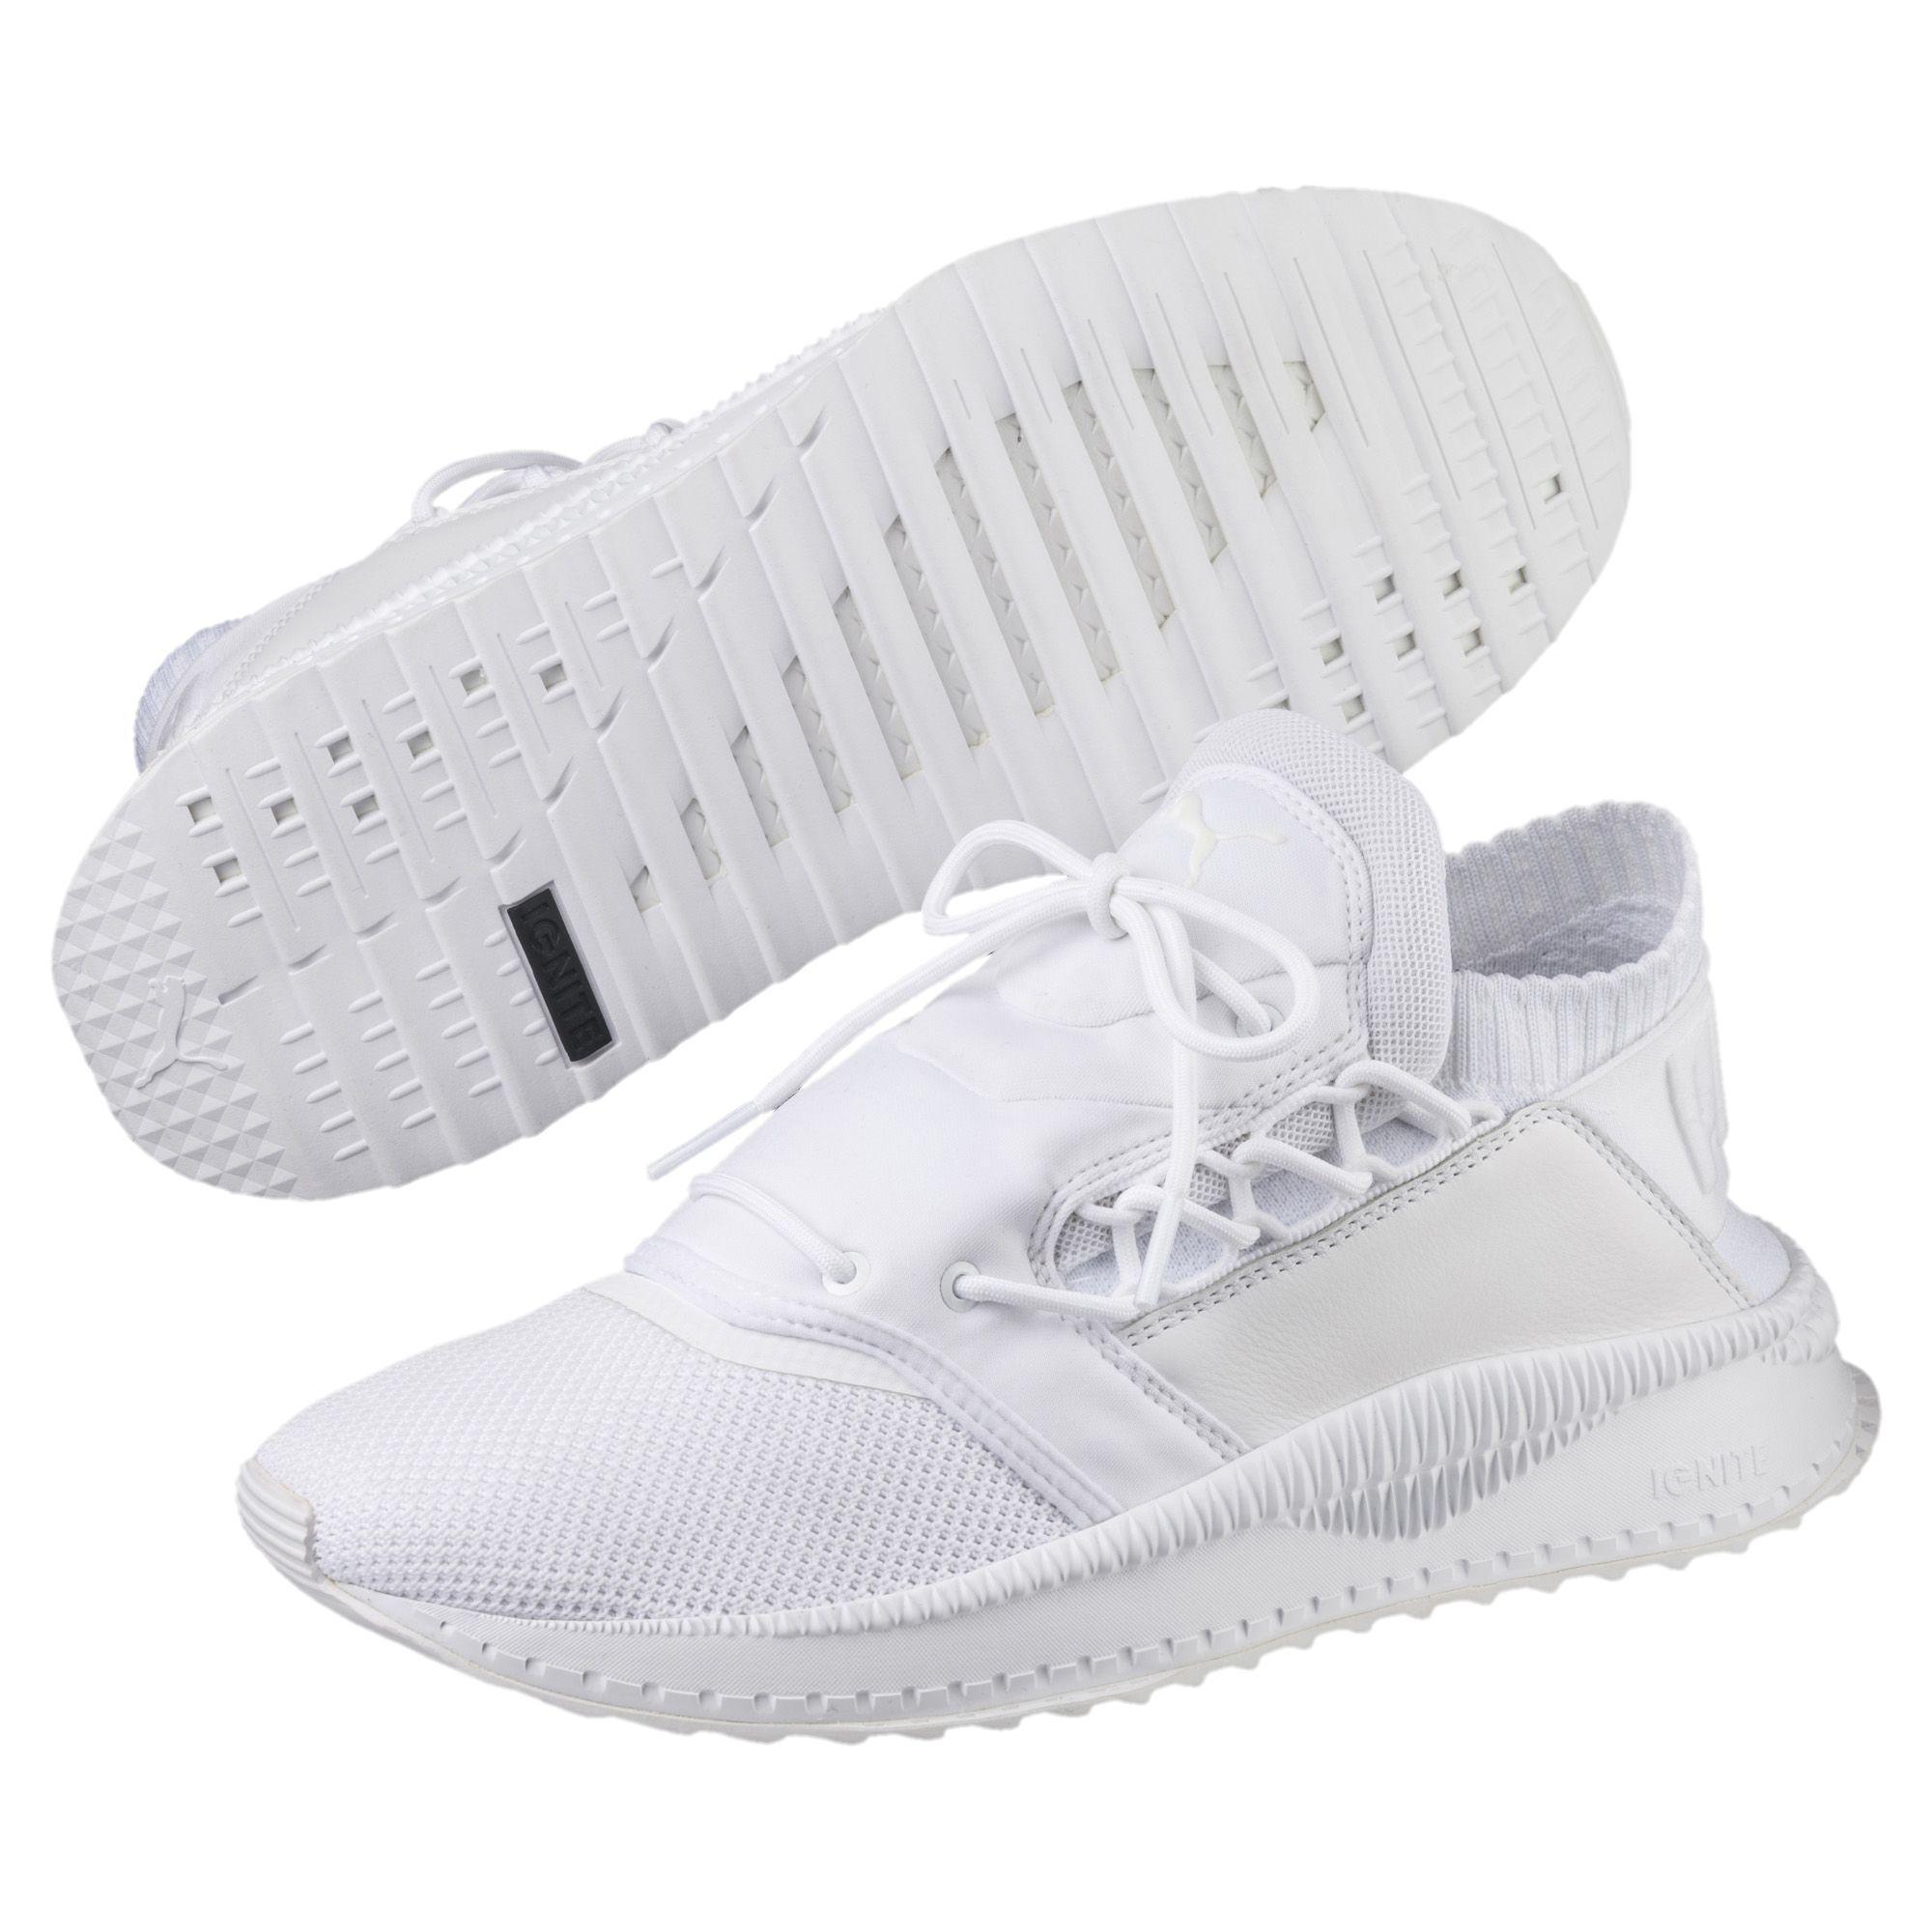 53c58d2098d2 Lyst - PUMA Tsugi Shinsei Men s Training Shoes in White for Men